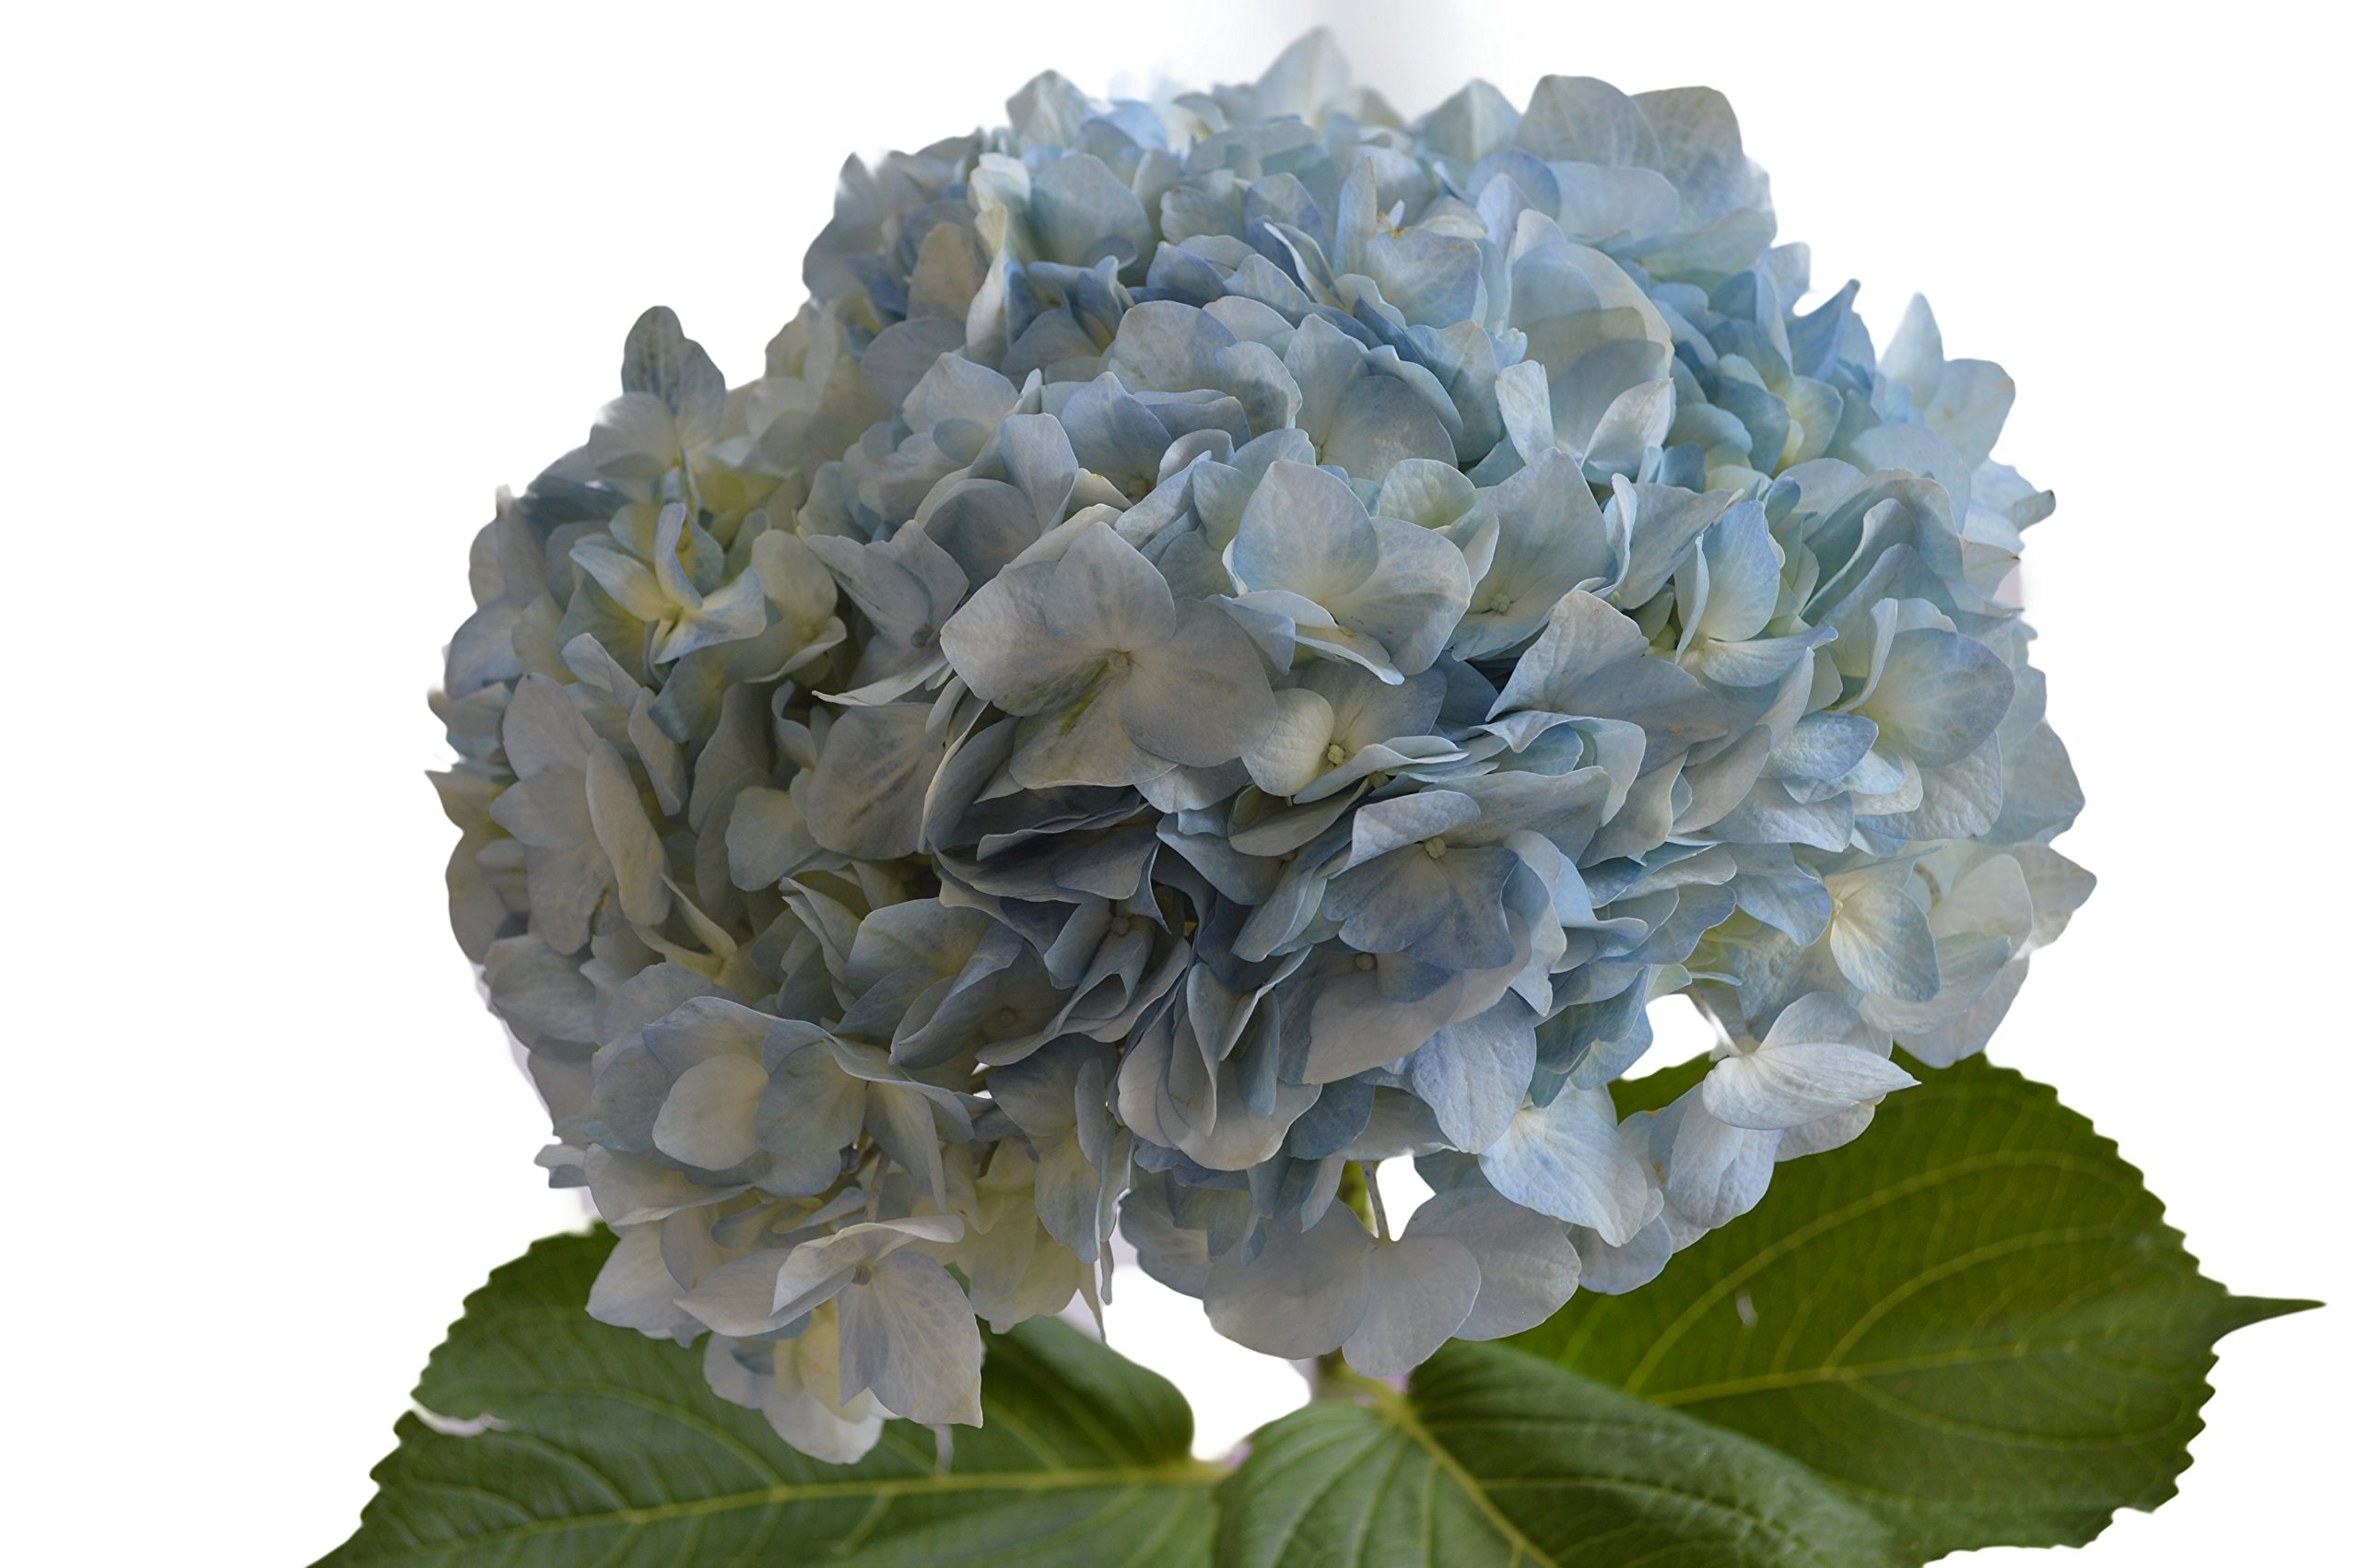 Blooms2Door 15 Blue Hydrangeas (Farm-Fresh, Naturally Colored, Premium Quality) by Blooms2Door (Image #3)